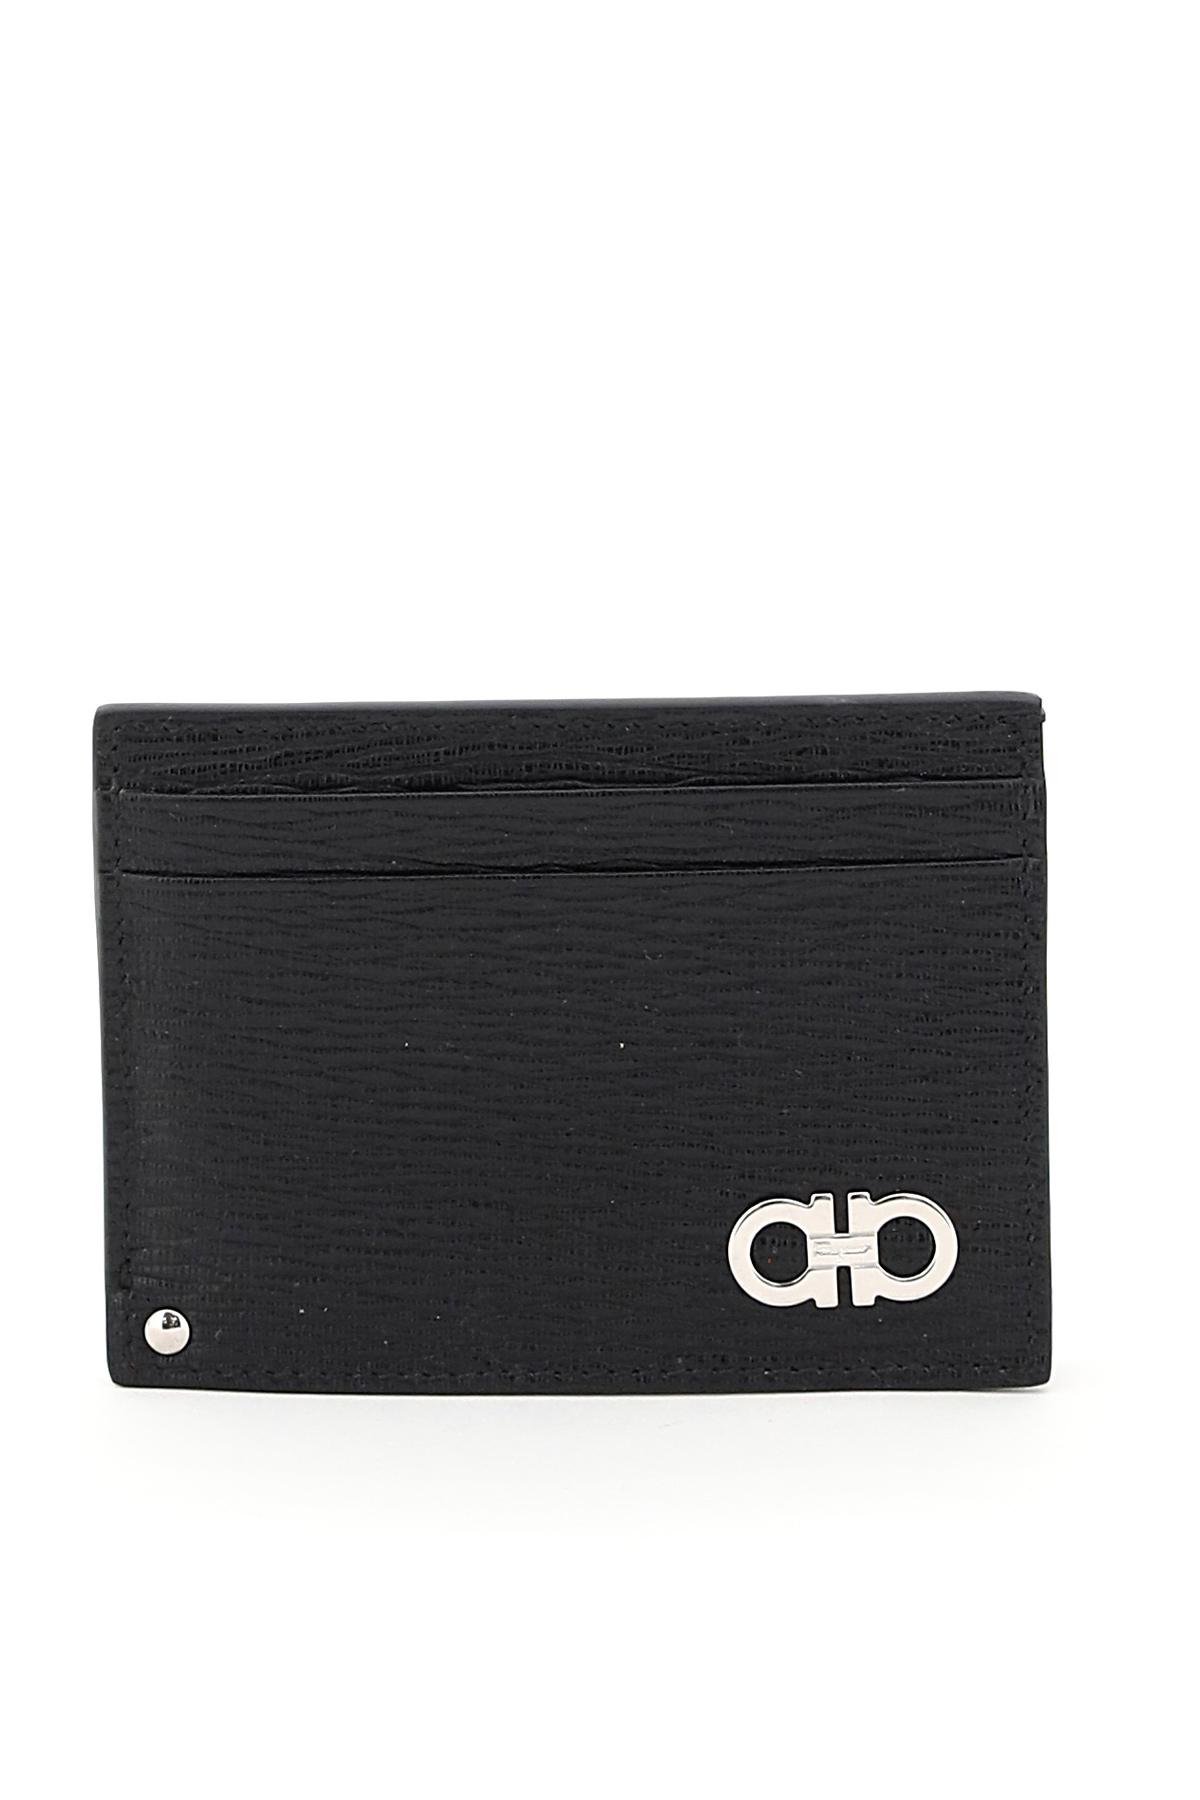 SALVATORE FERRAGAMO GANCINI CREDIT CARD HOLDER OS Black, Red Leather